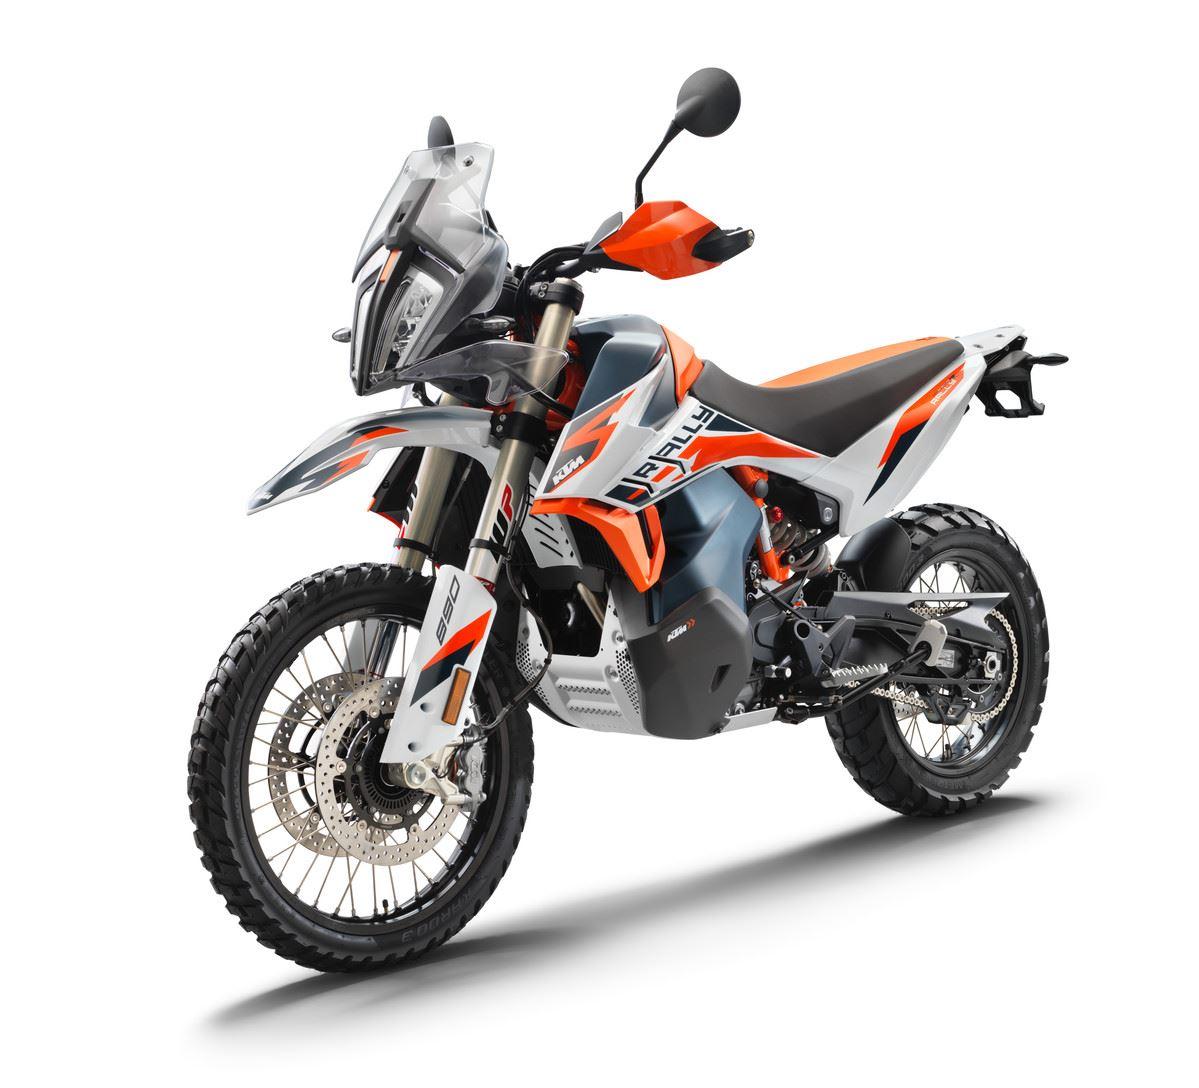 Ktm 890 Adventure R Rally 2021